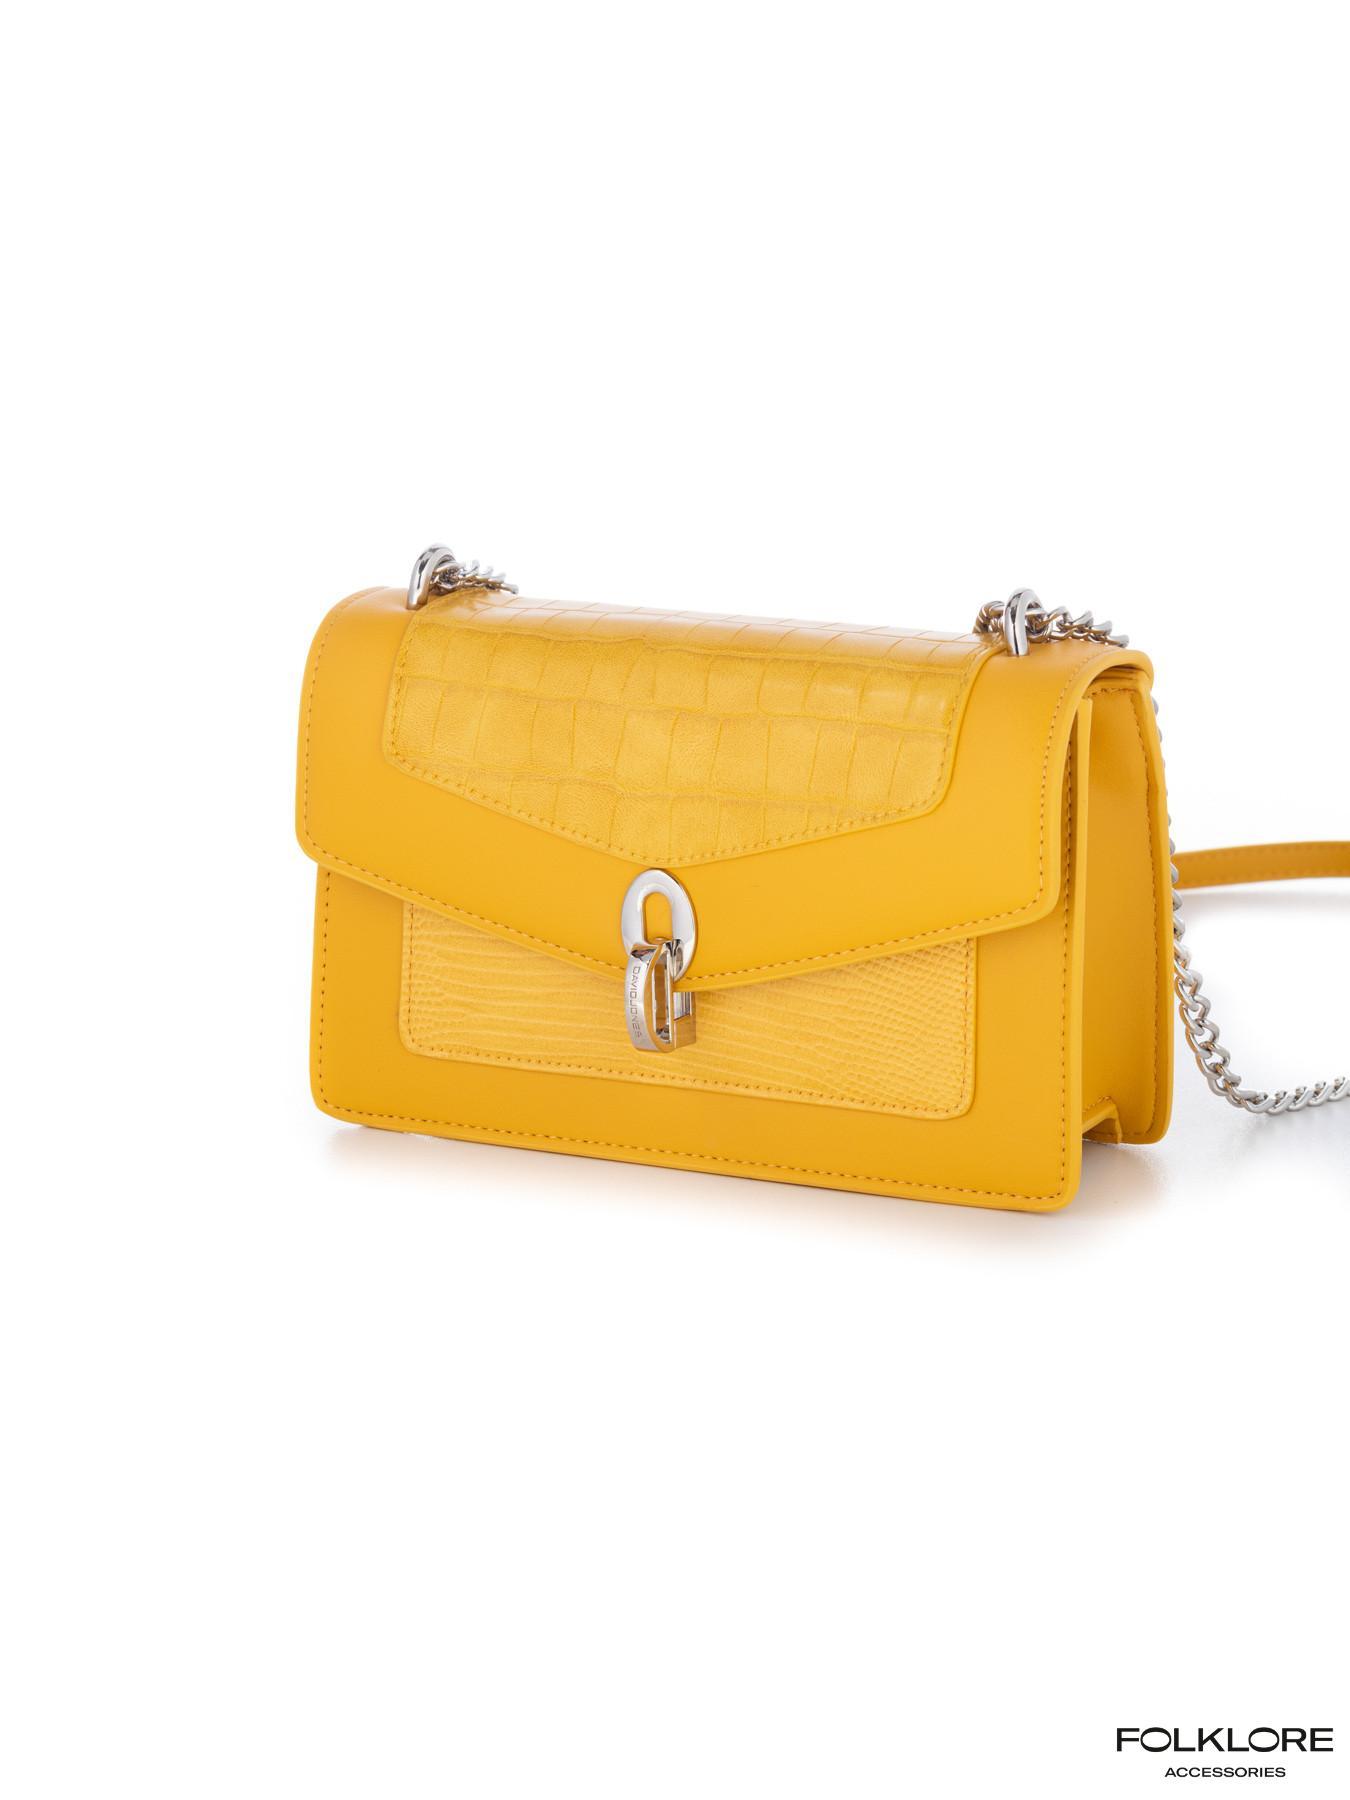 DAVID JONES Elegantna žuta tašnica sa srebrnim lancem